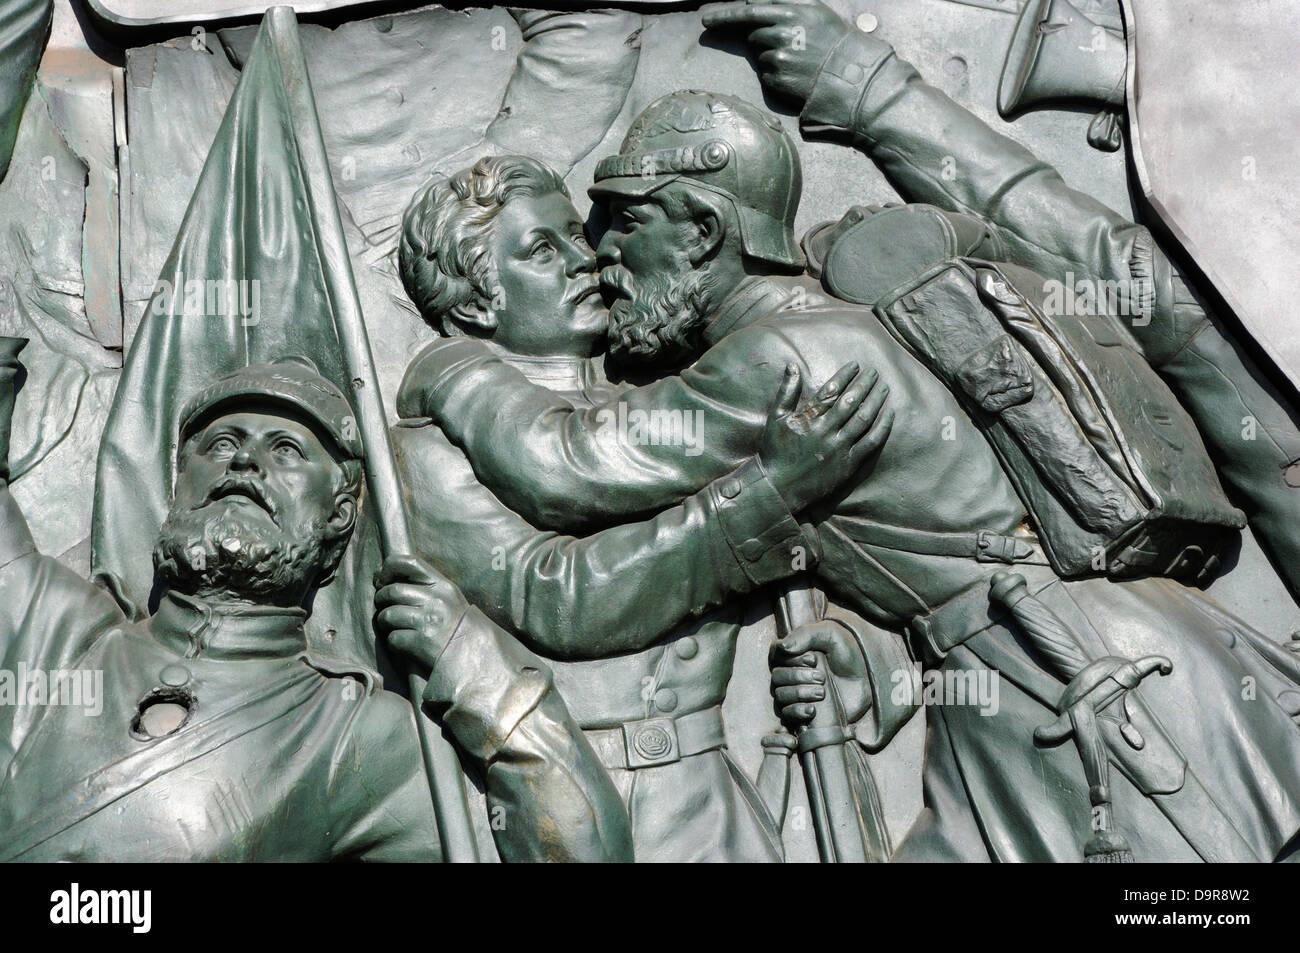 Part of the bronze relief by Moriz Schulz at the base of the Siegessaule or Victory Column, Tiergarten, Berlin, - Stock Image